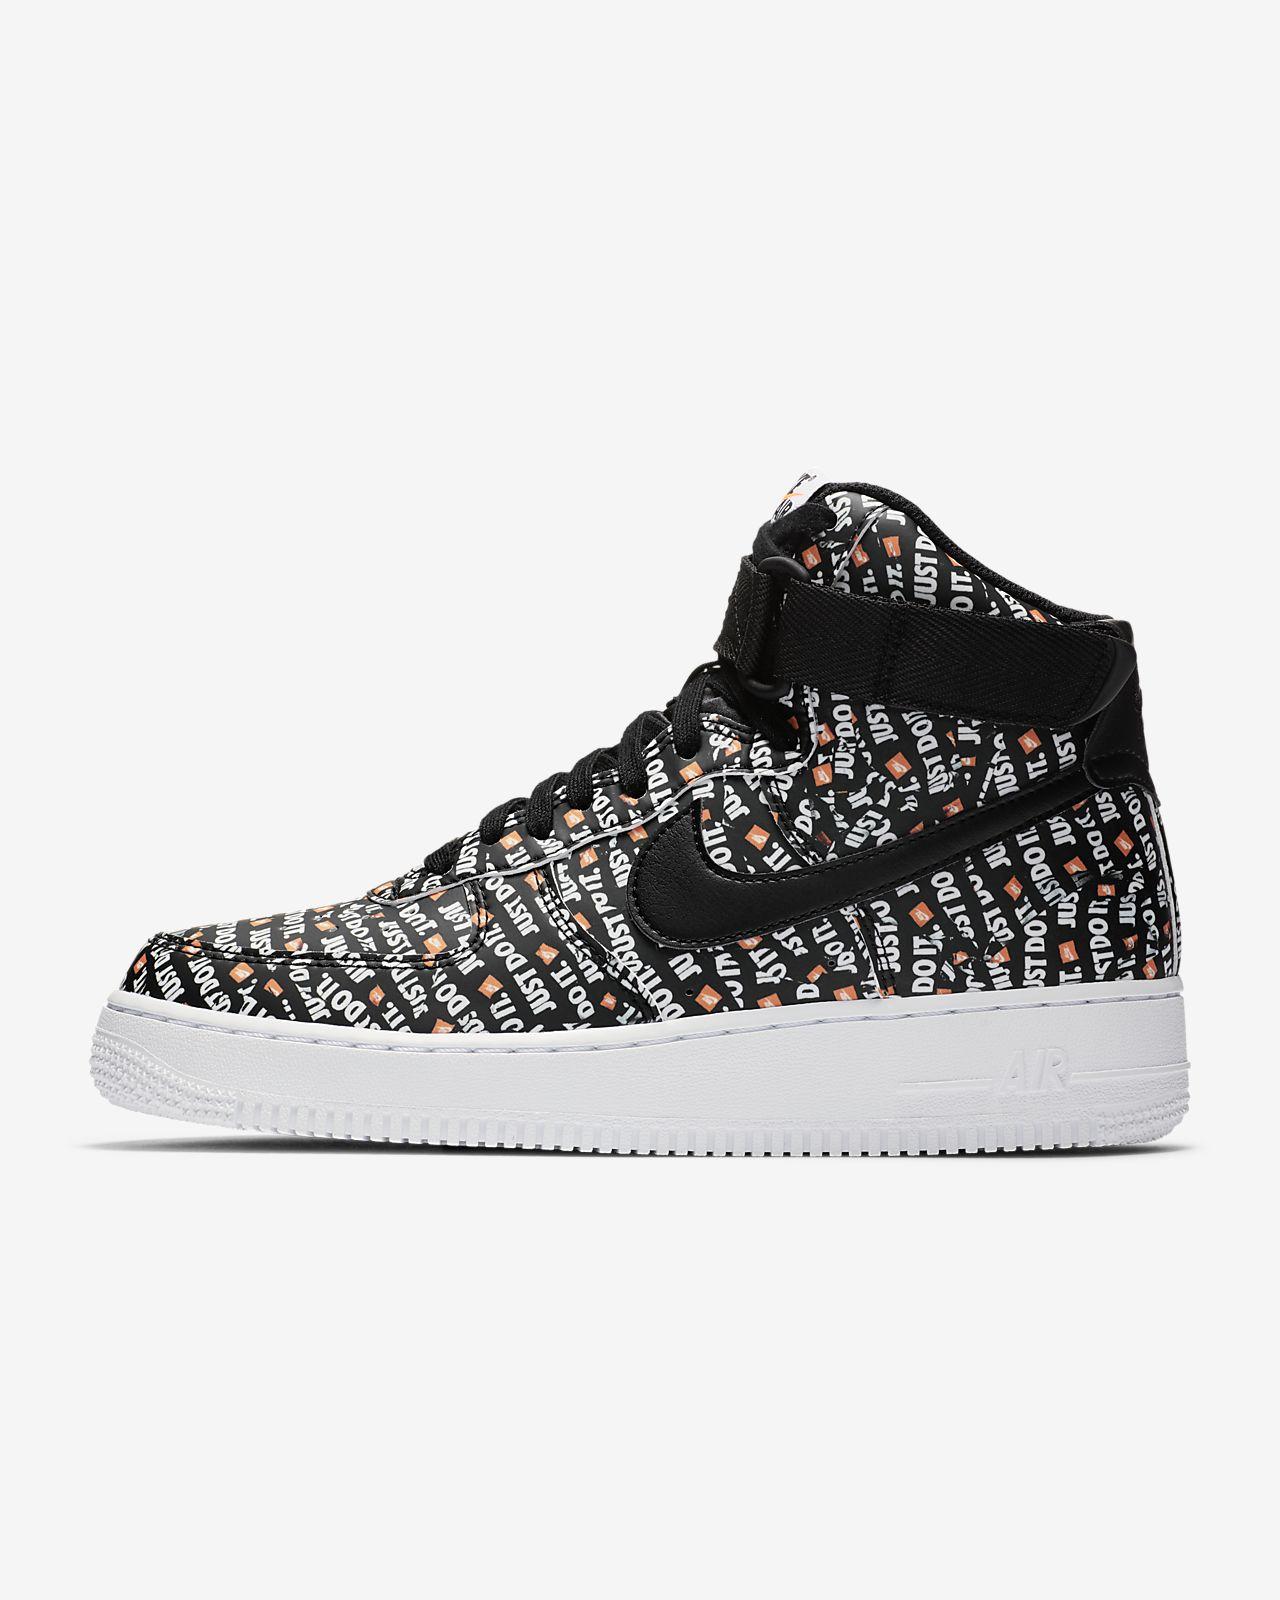 sports shoes afbf2 277af Sko High Kvinnor Se För Nike Air 1 Force Lx nIIaqr